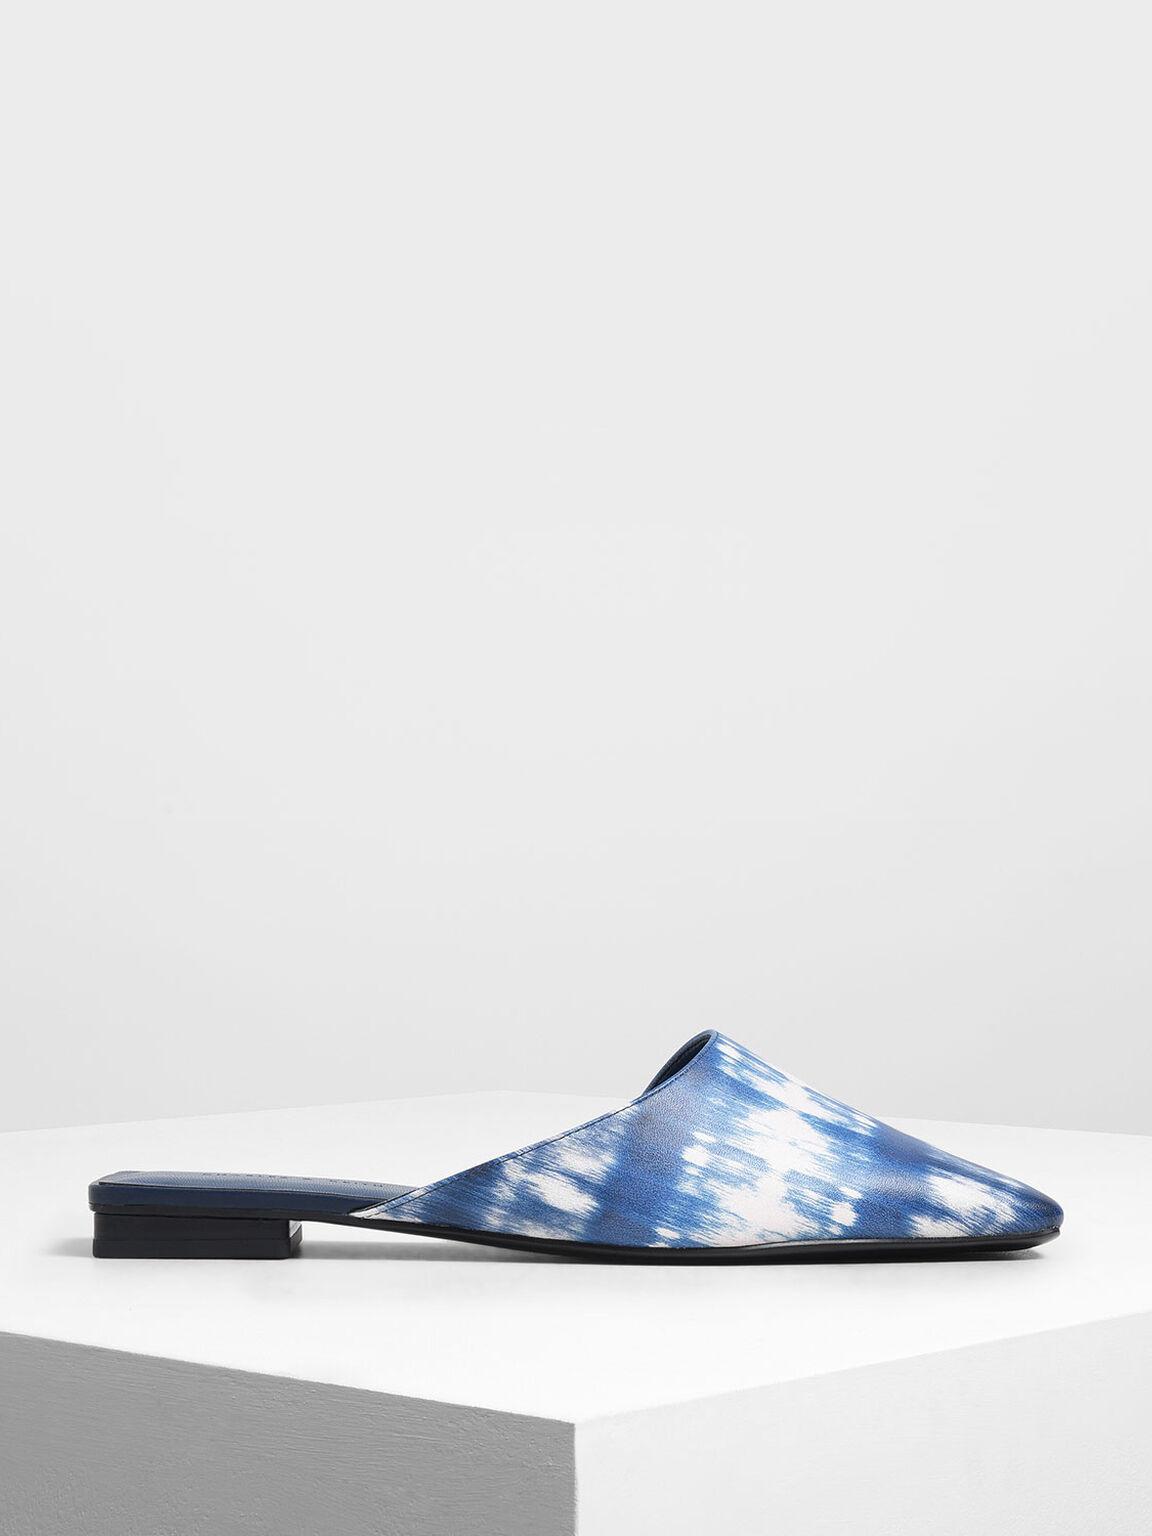 Printed Square Toe Asymmetrical Mules, Dark Blue, hi-res